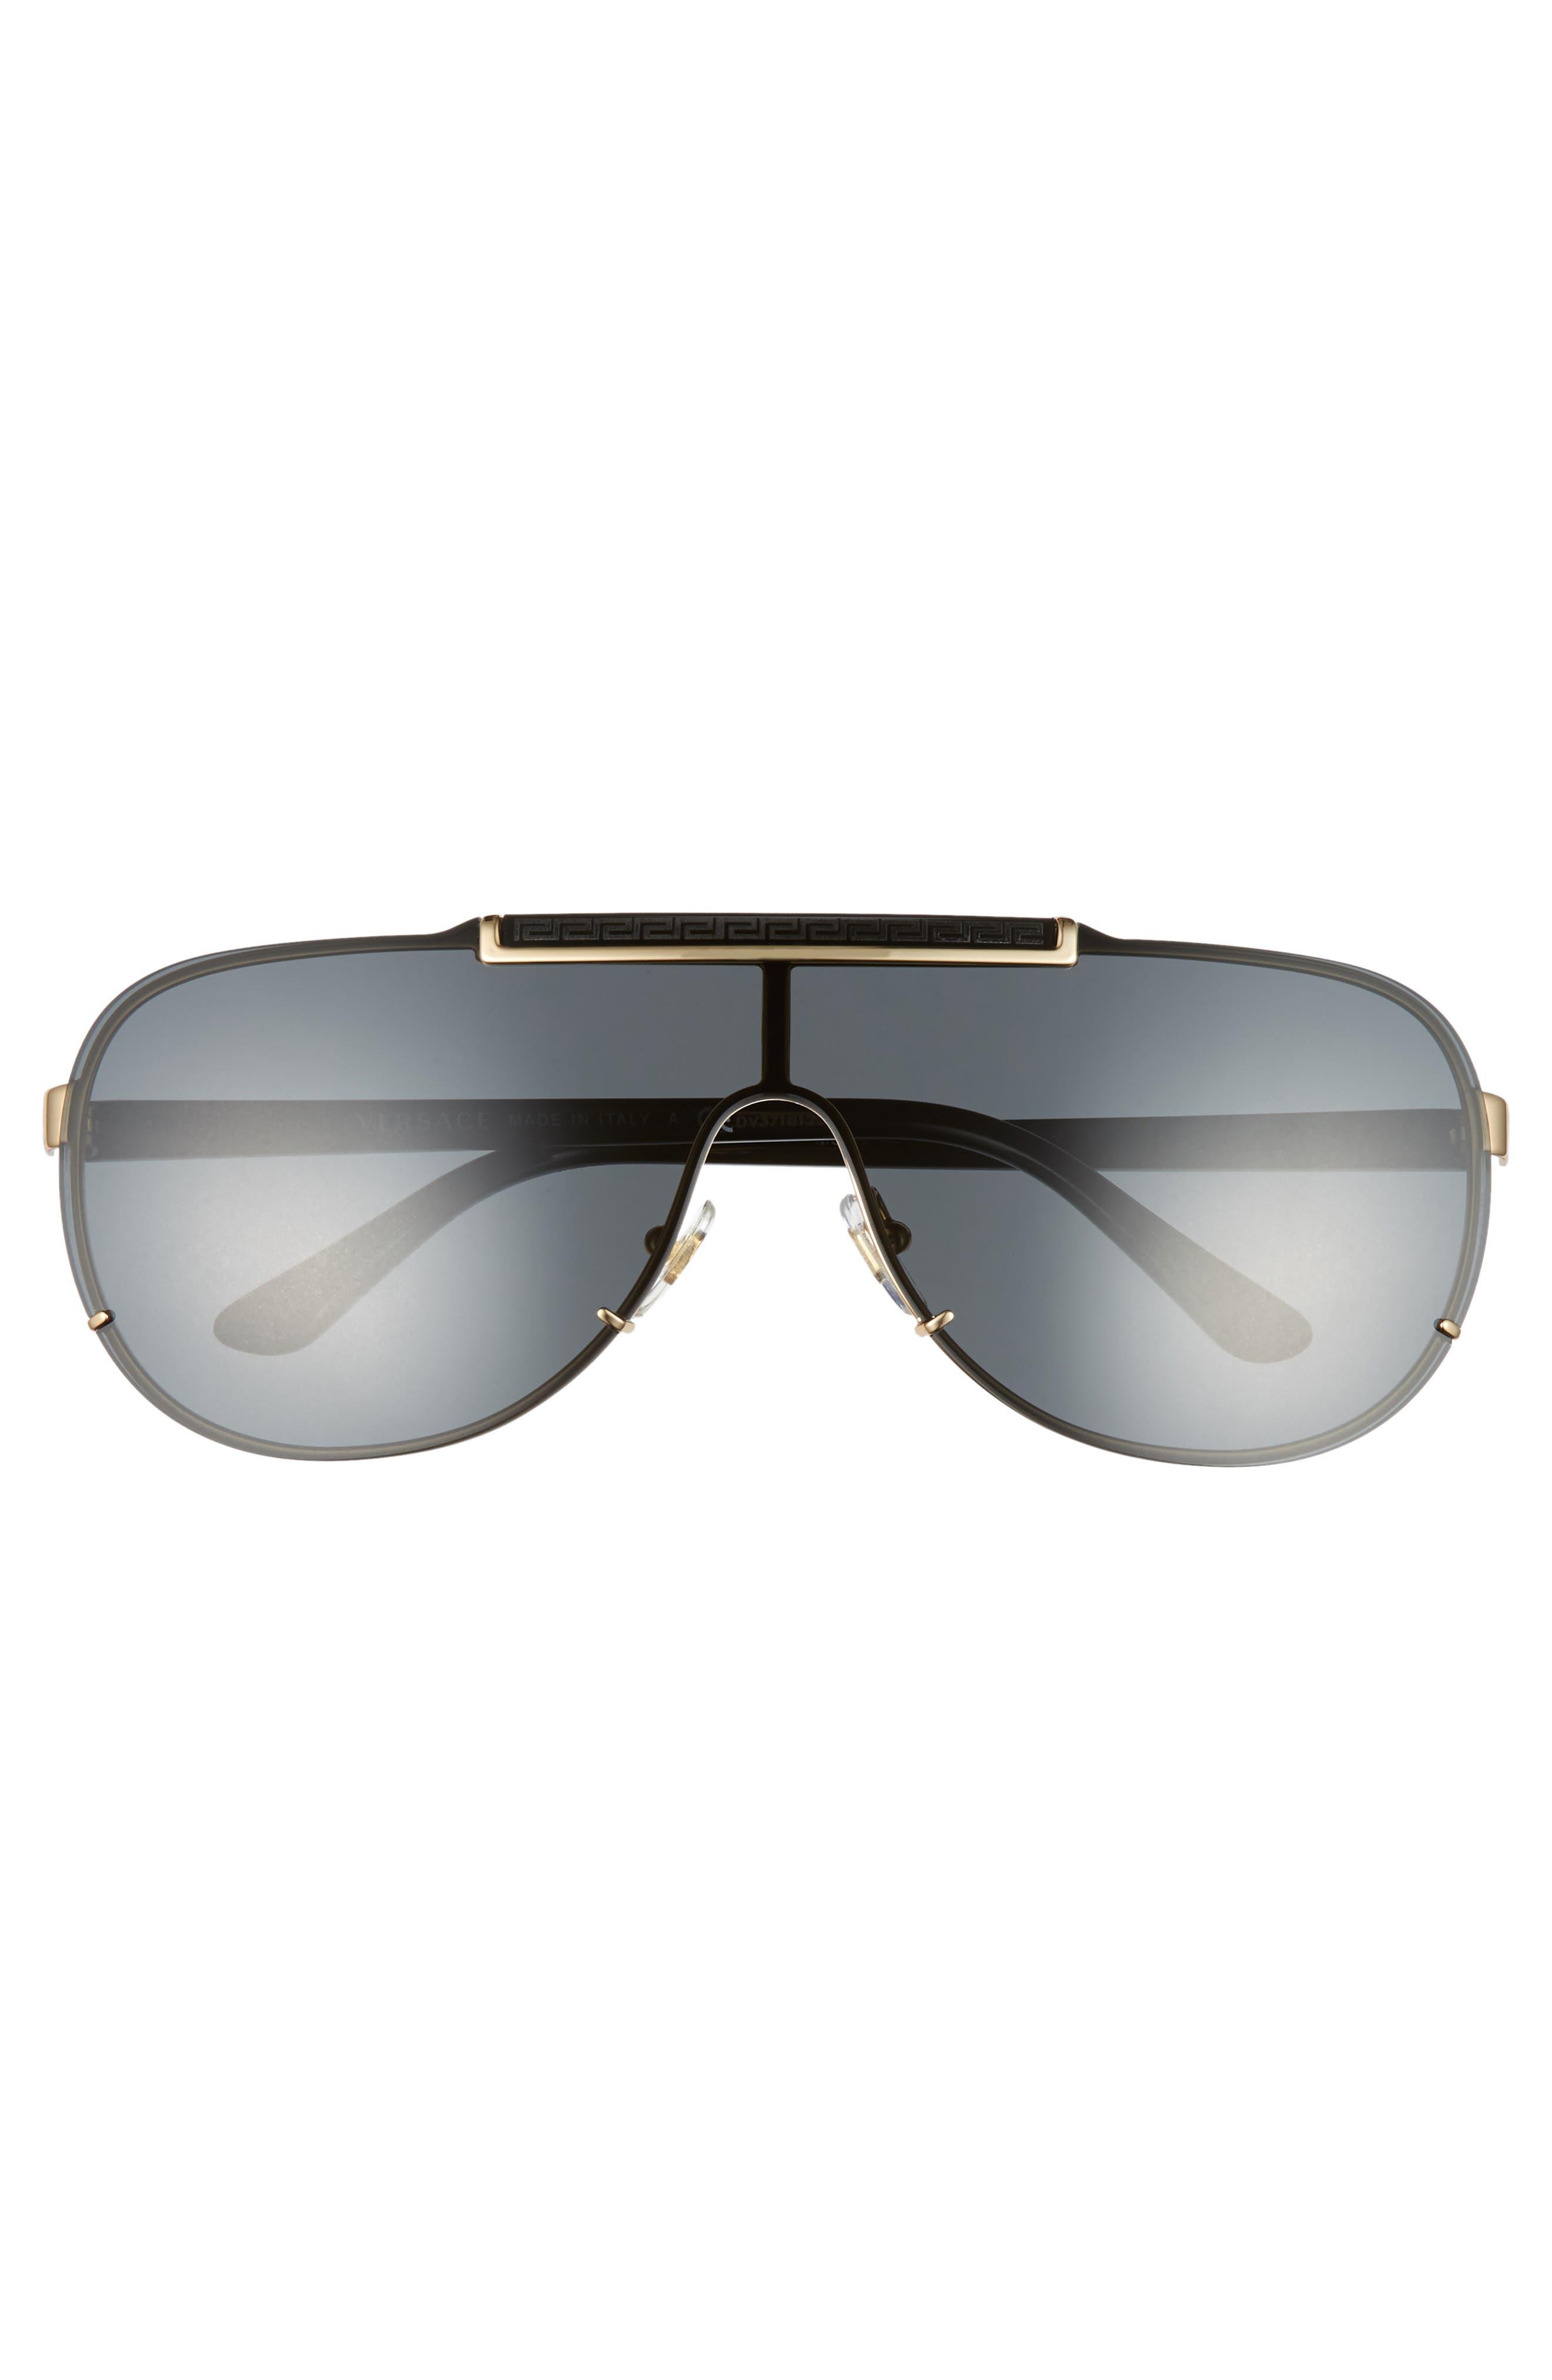 40mm Shield Sunglasses,                             Alternate thumbnail 3, color,                             007